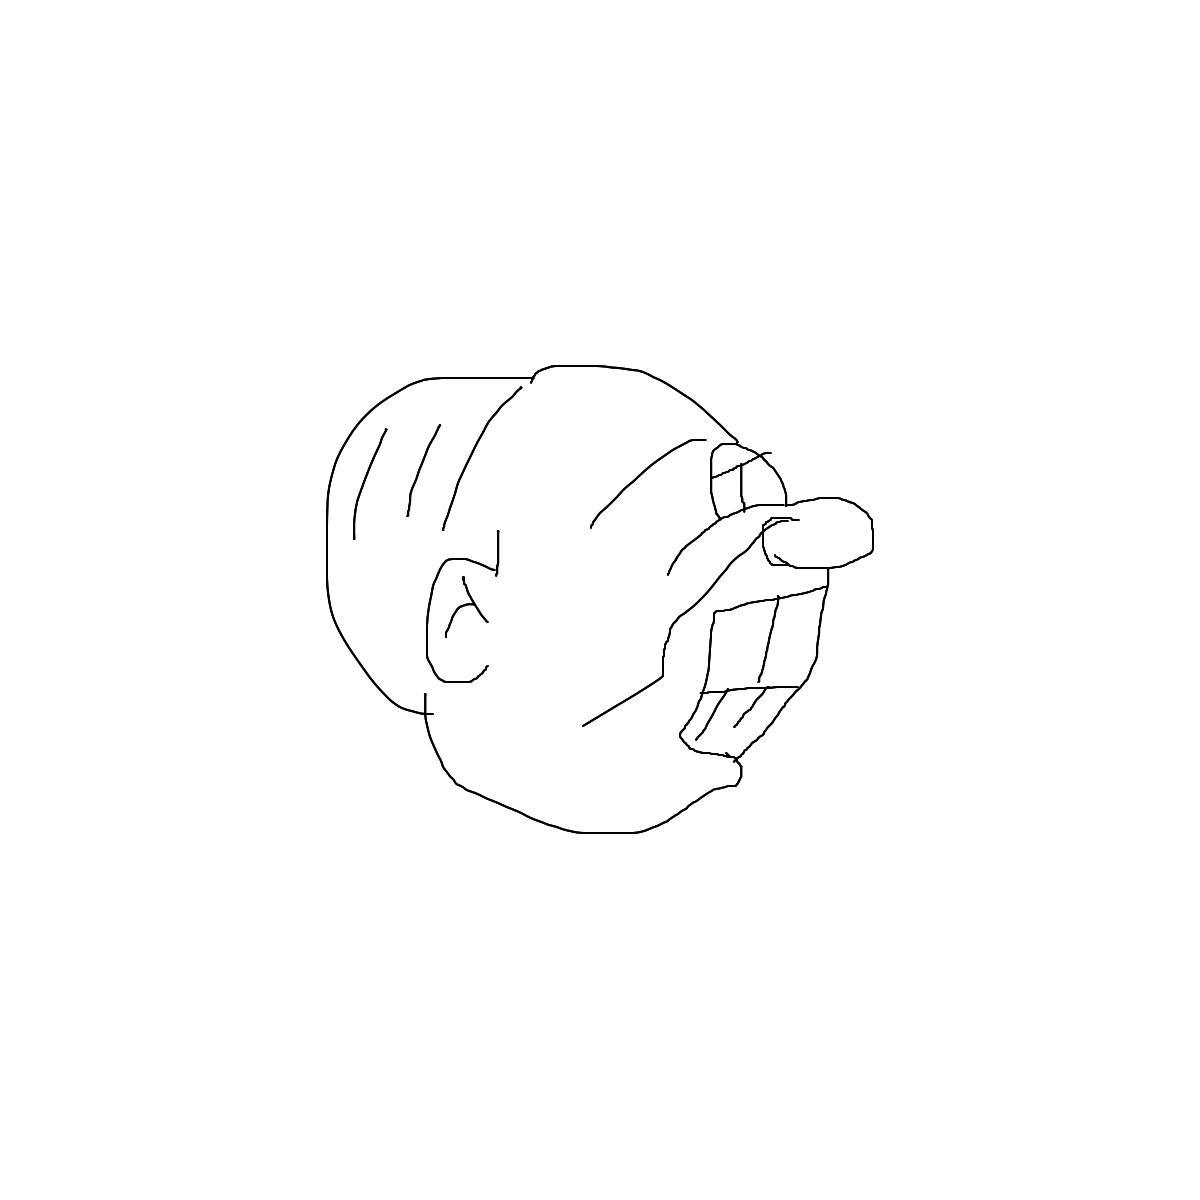 BAAAM drawing#7781 lat:43.6682434082031250lng: 18.9769515991210940